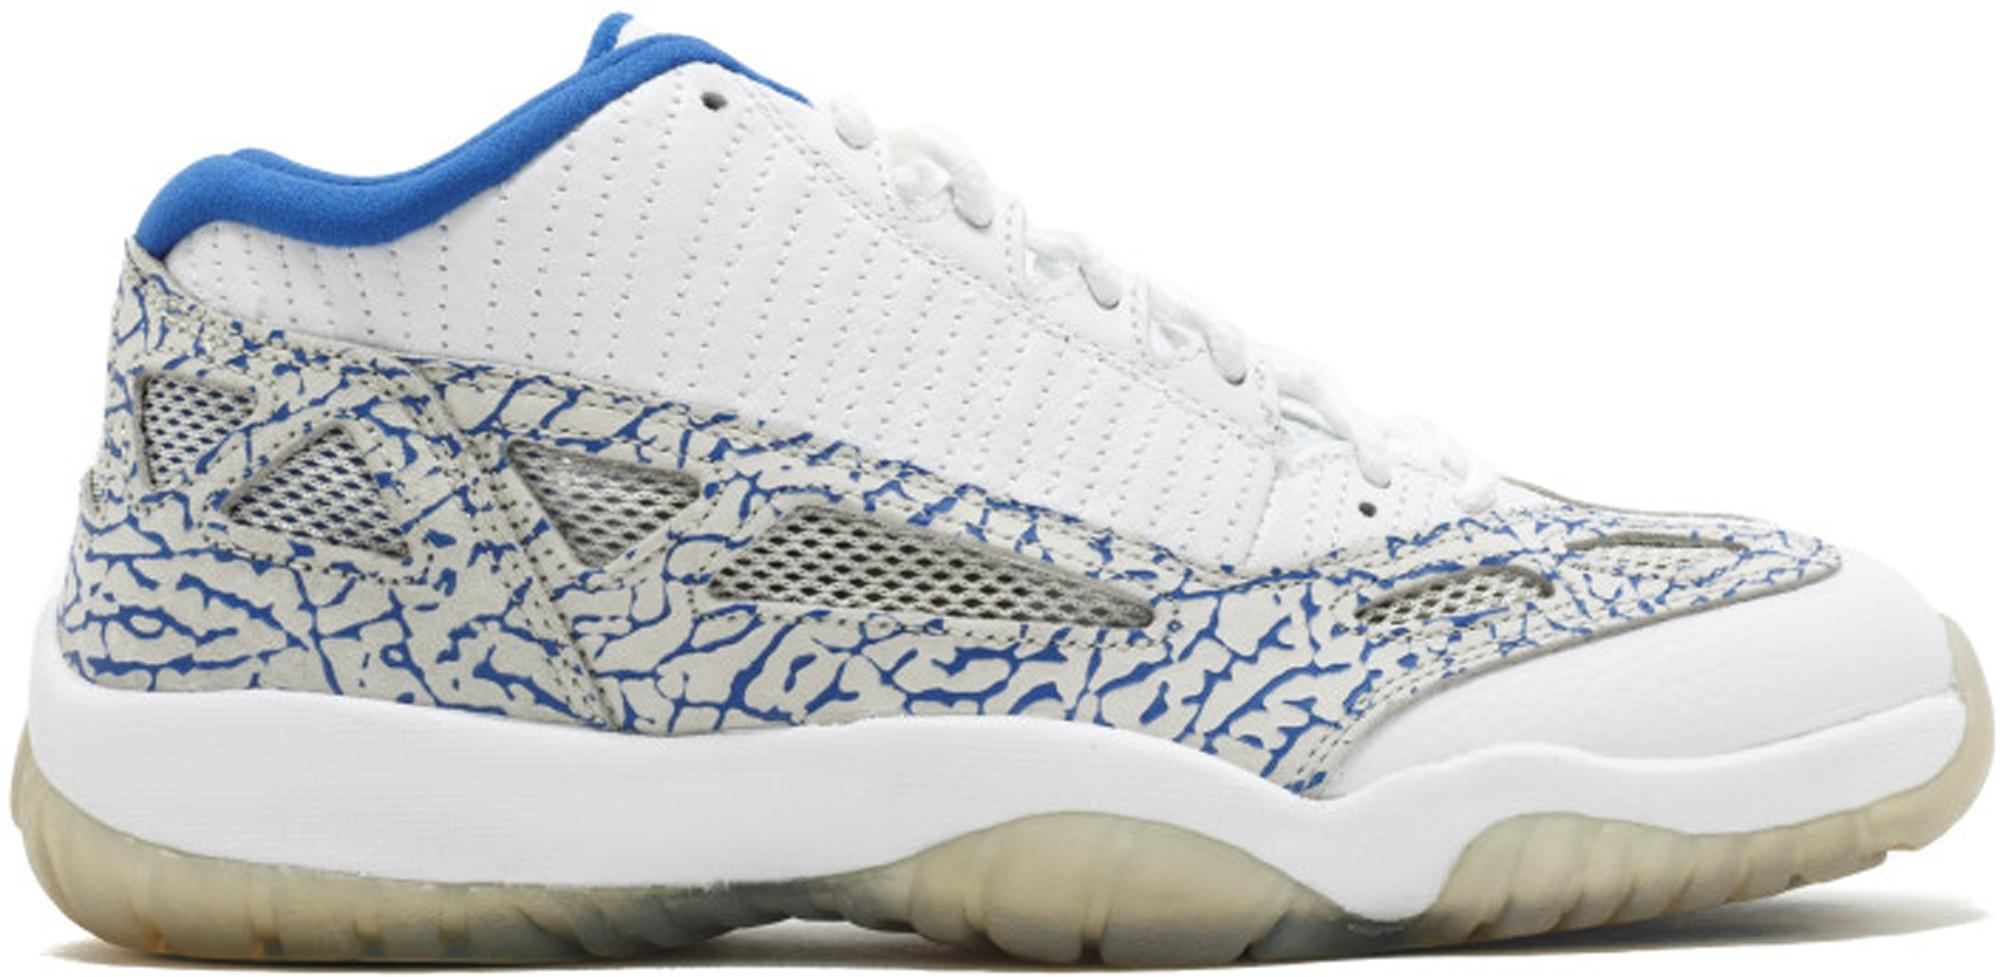 Jordan 11 Retro Low IE White Argon Blue